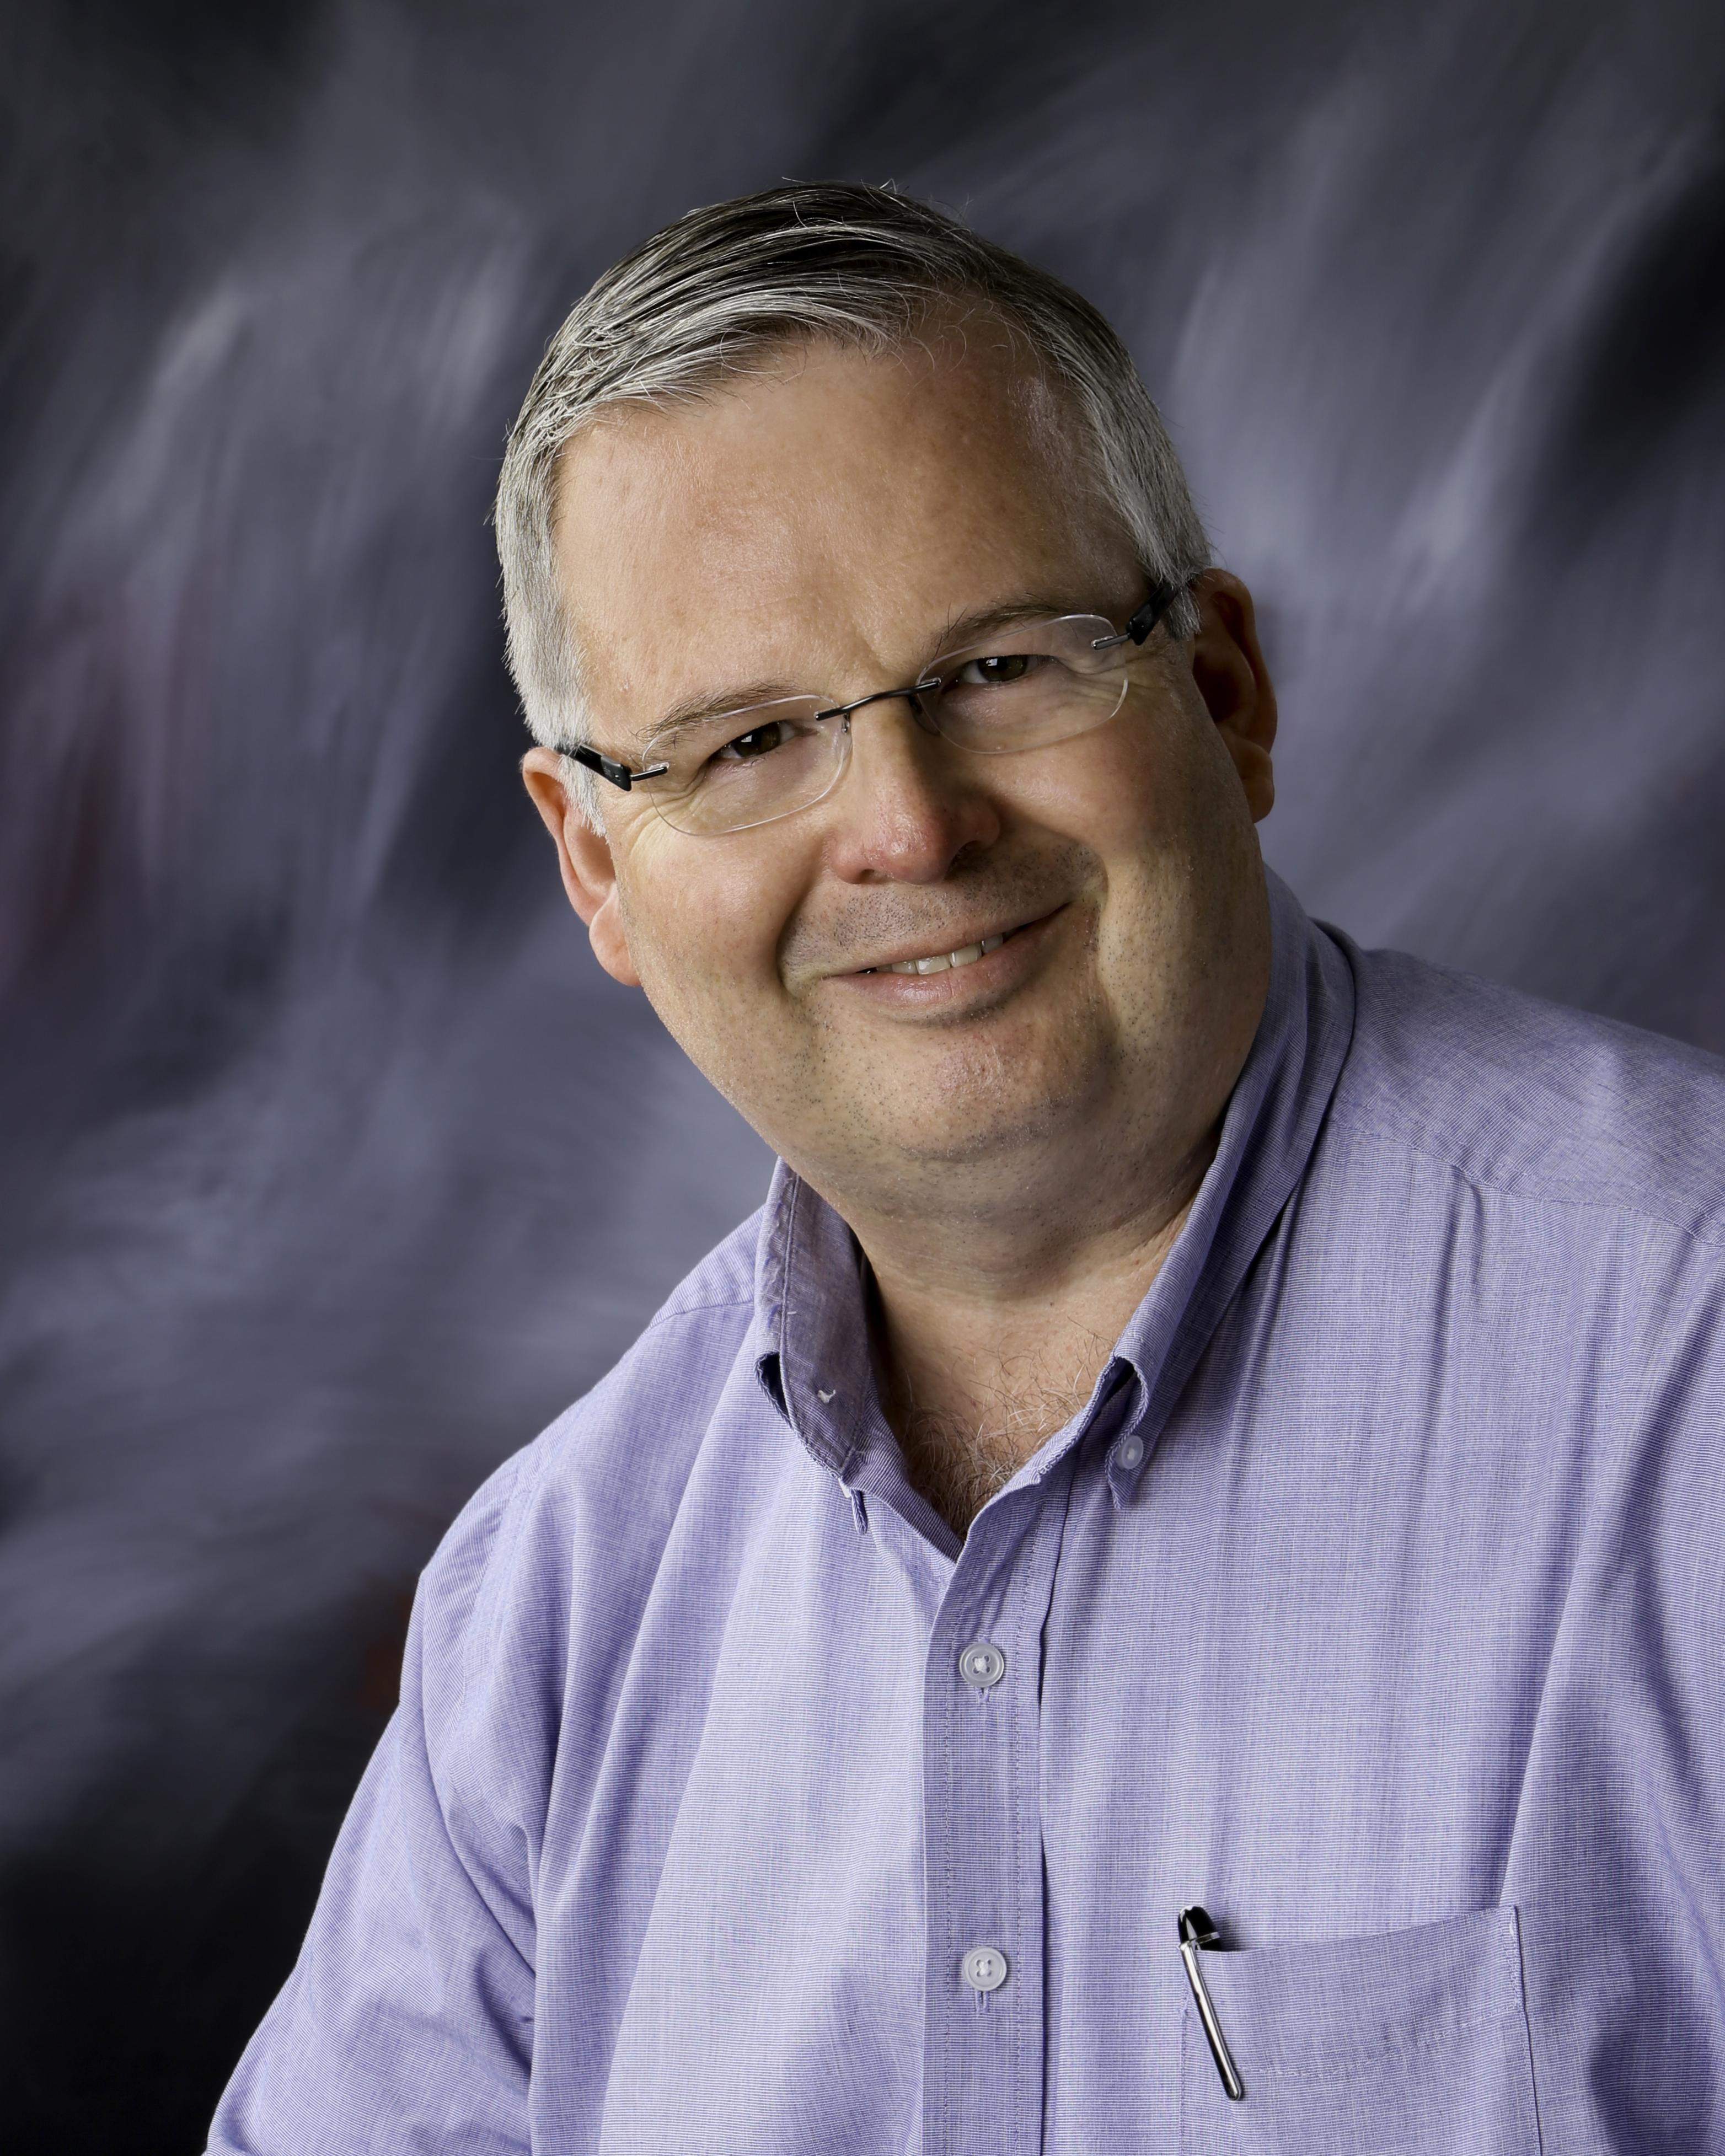 Michael Stone Headshot